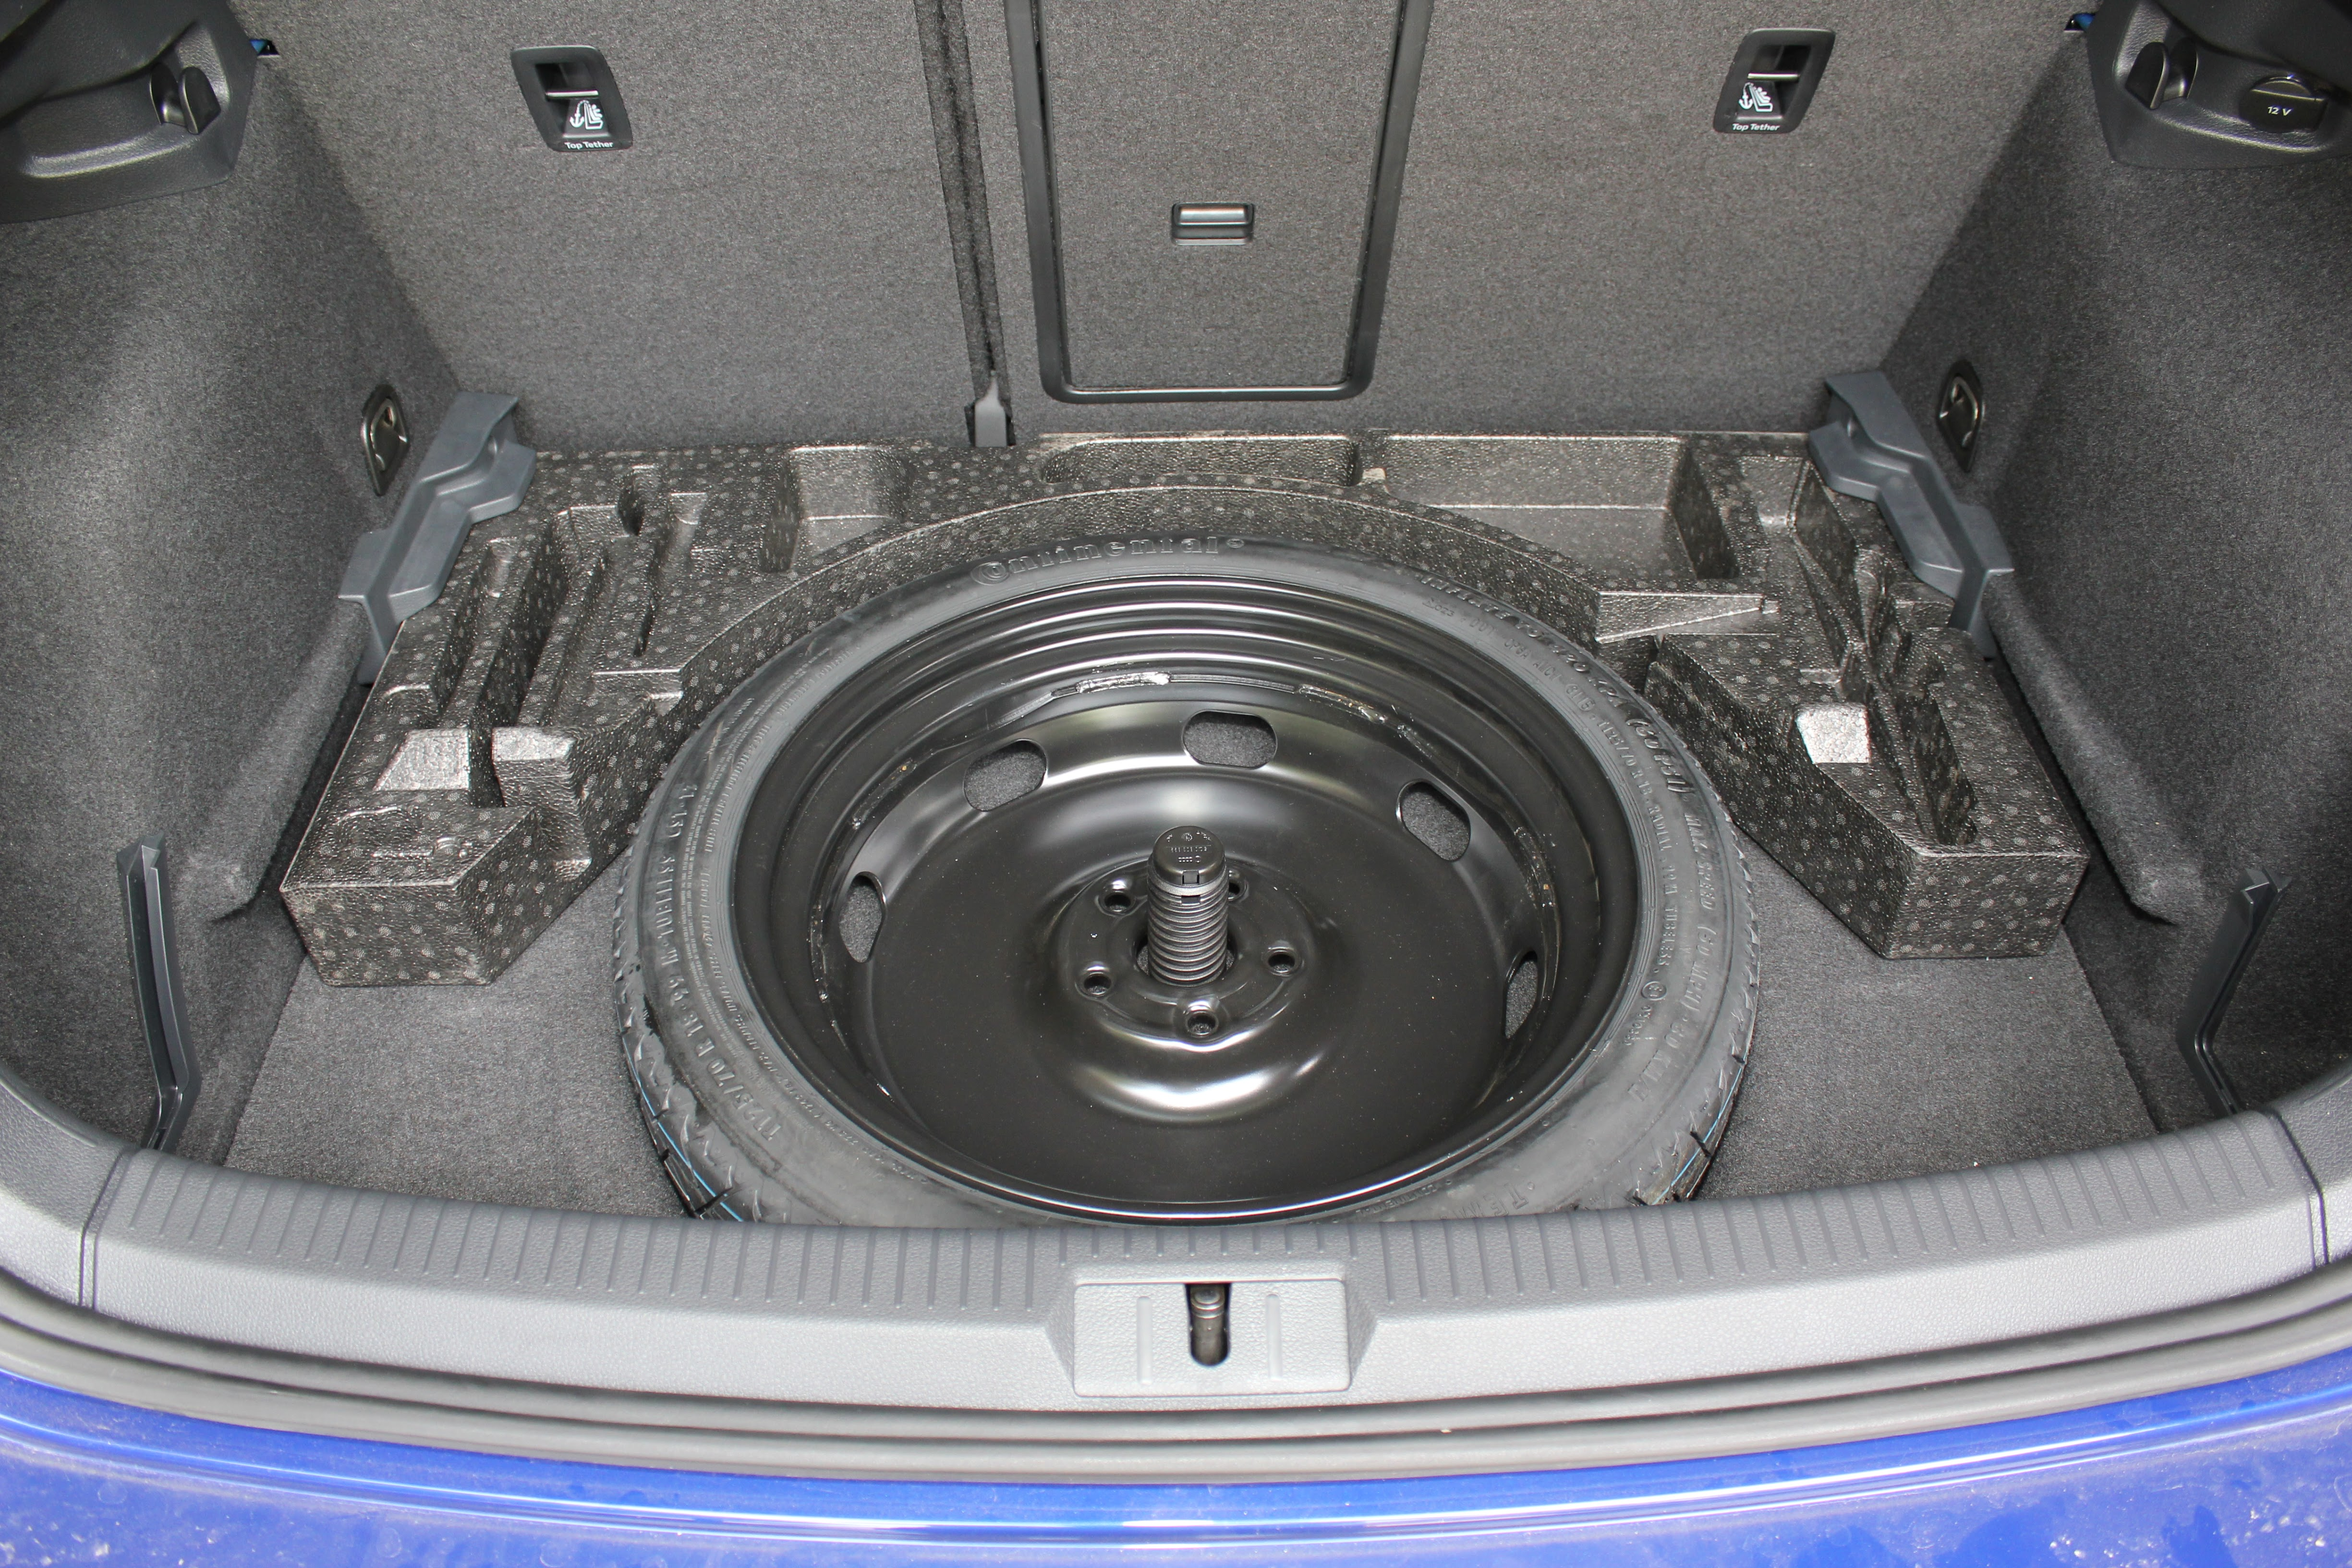 Golf R Spare Tire Kit